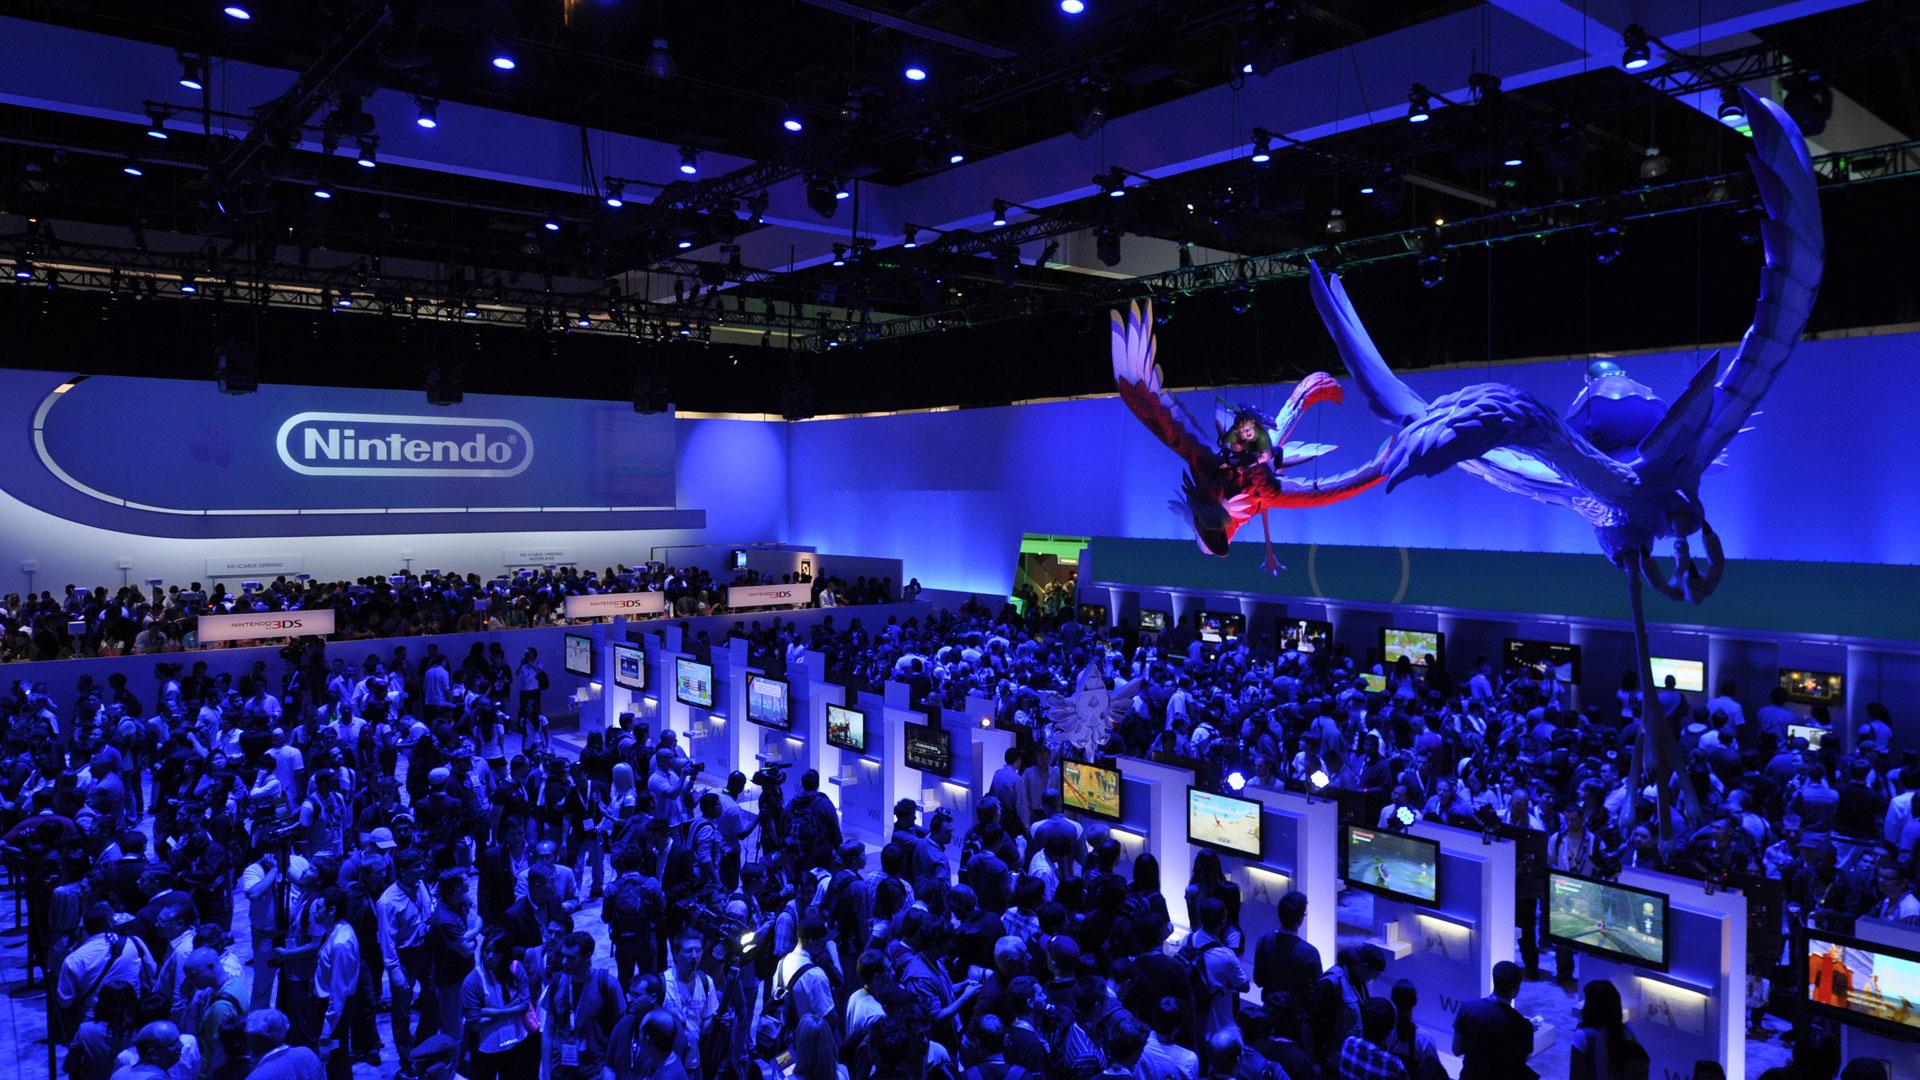 Escenario de Nintendo dentro del E3 2018